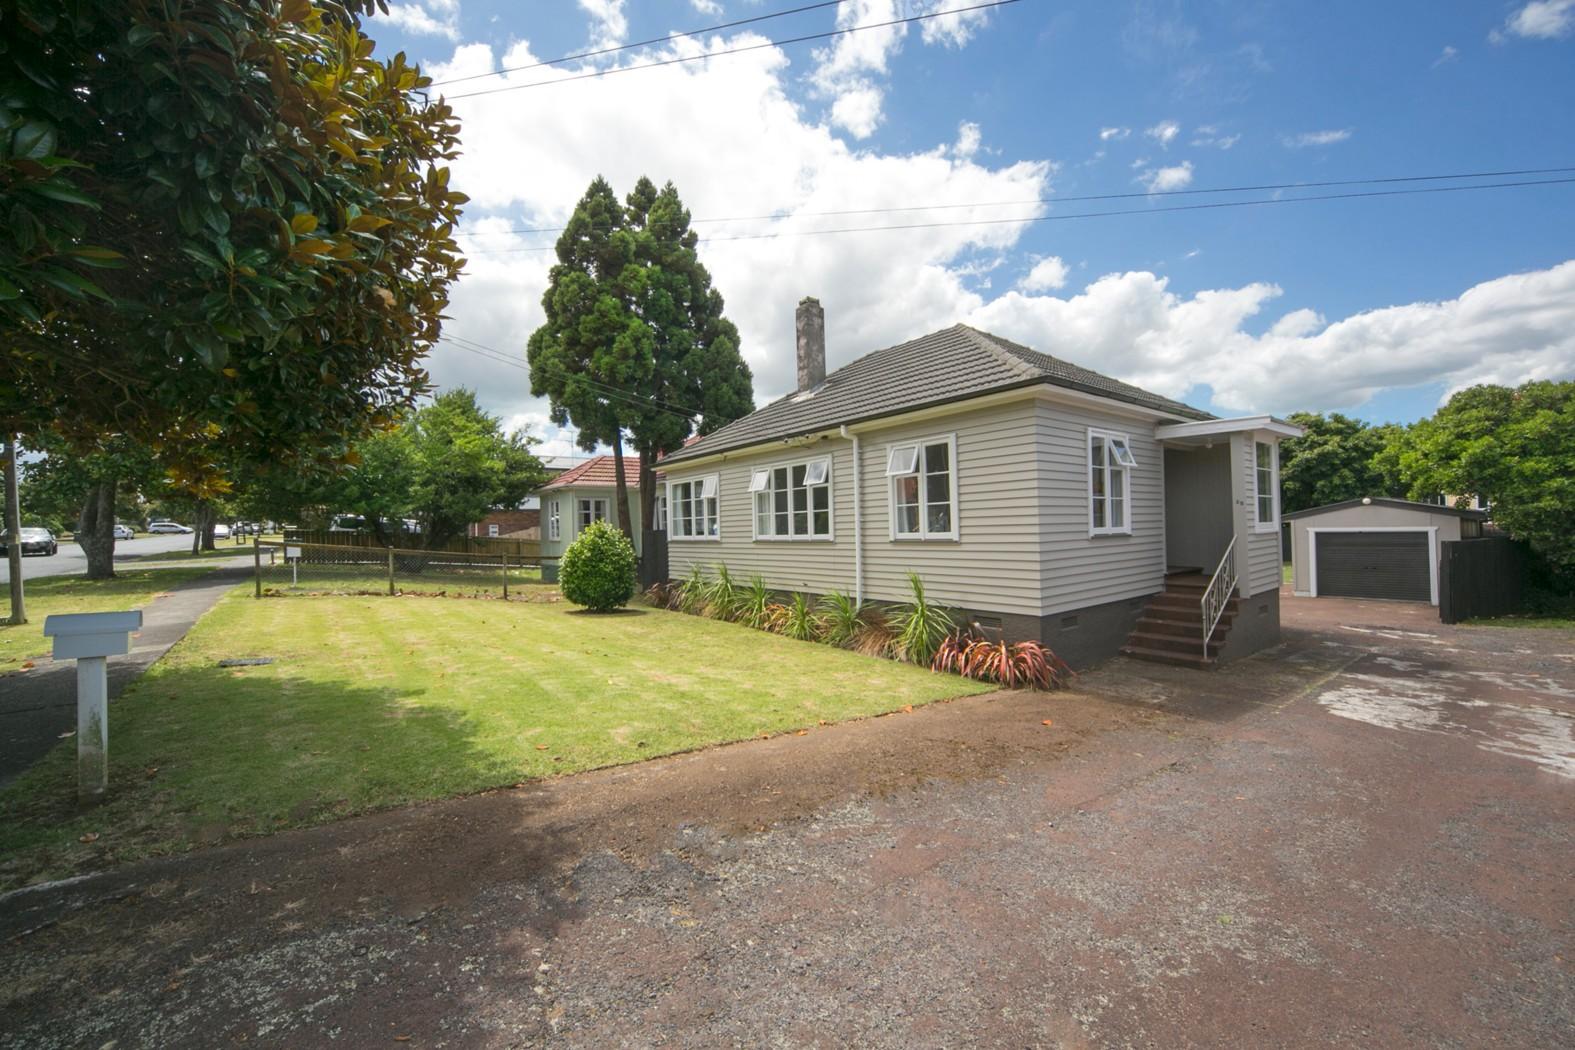 35 Waitangi Road, ONEHUNGA, Auckland City 1061 - Sold ...